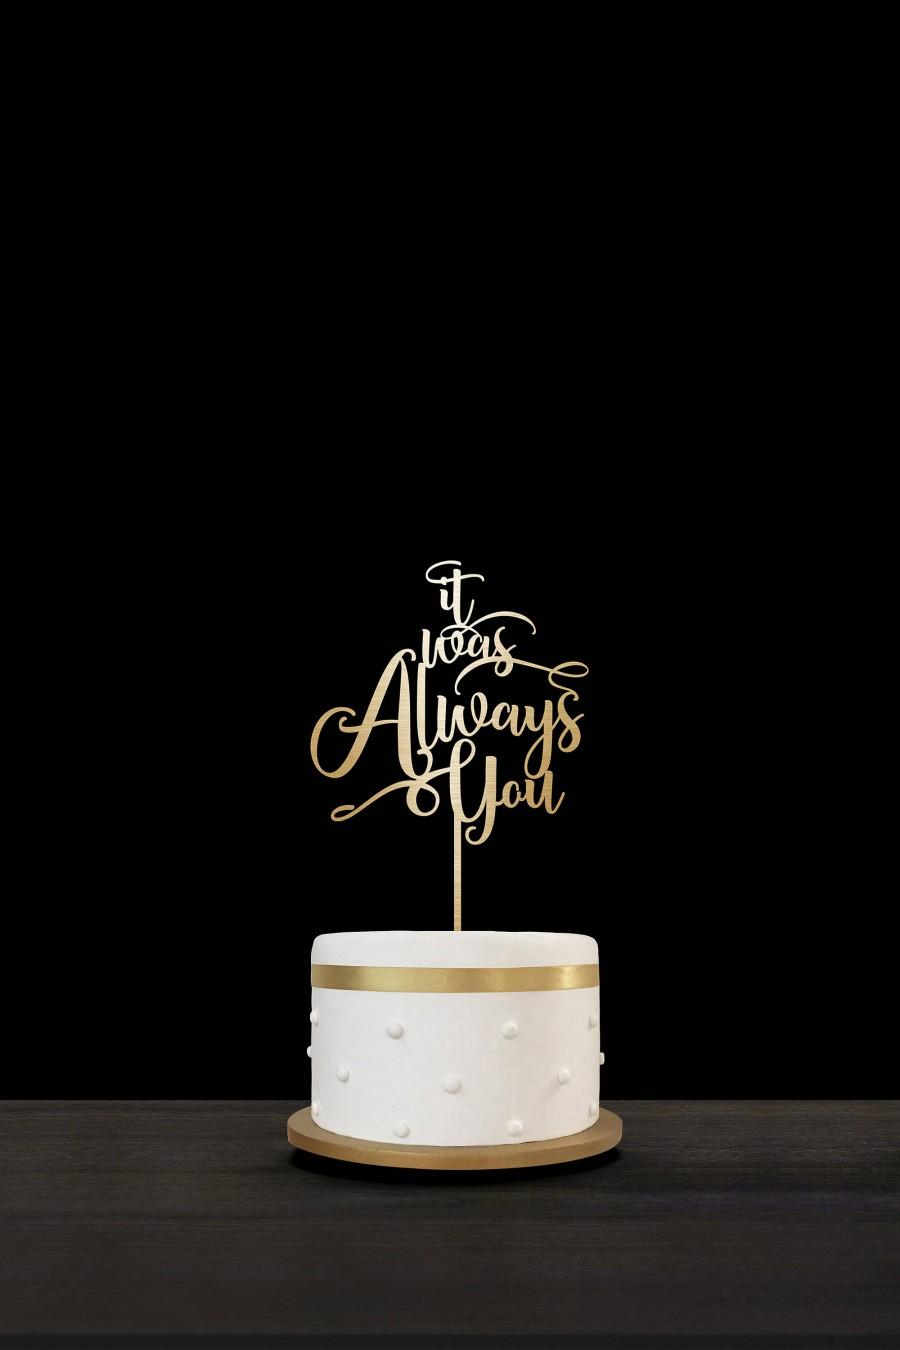 Свадьба - Customized Wedding Cake Topper Personalized Cake Topper for Wedding, Personalized Wedding Cake Topper It Was Always You Cake Topper 17